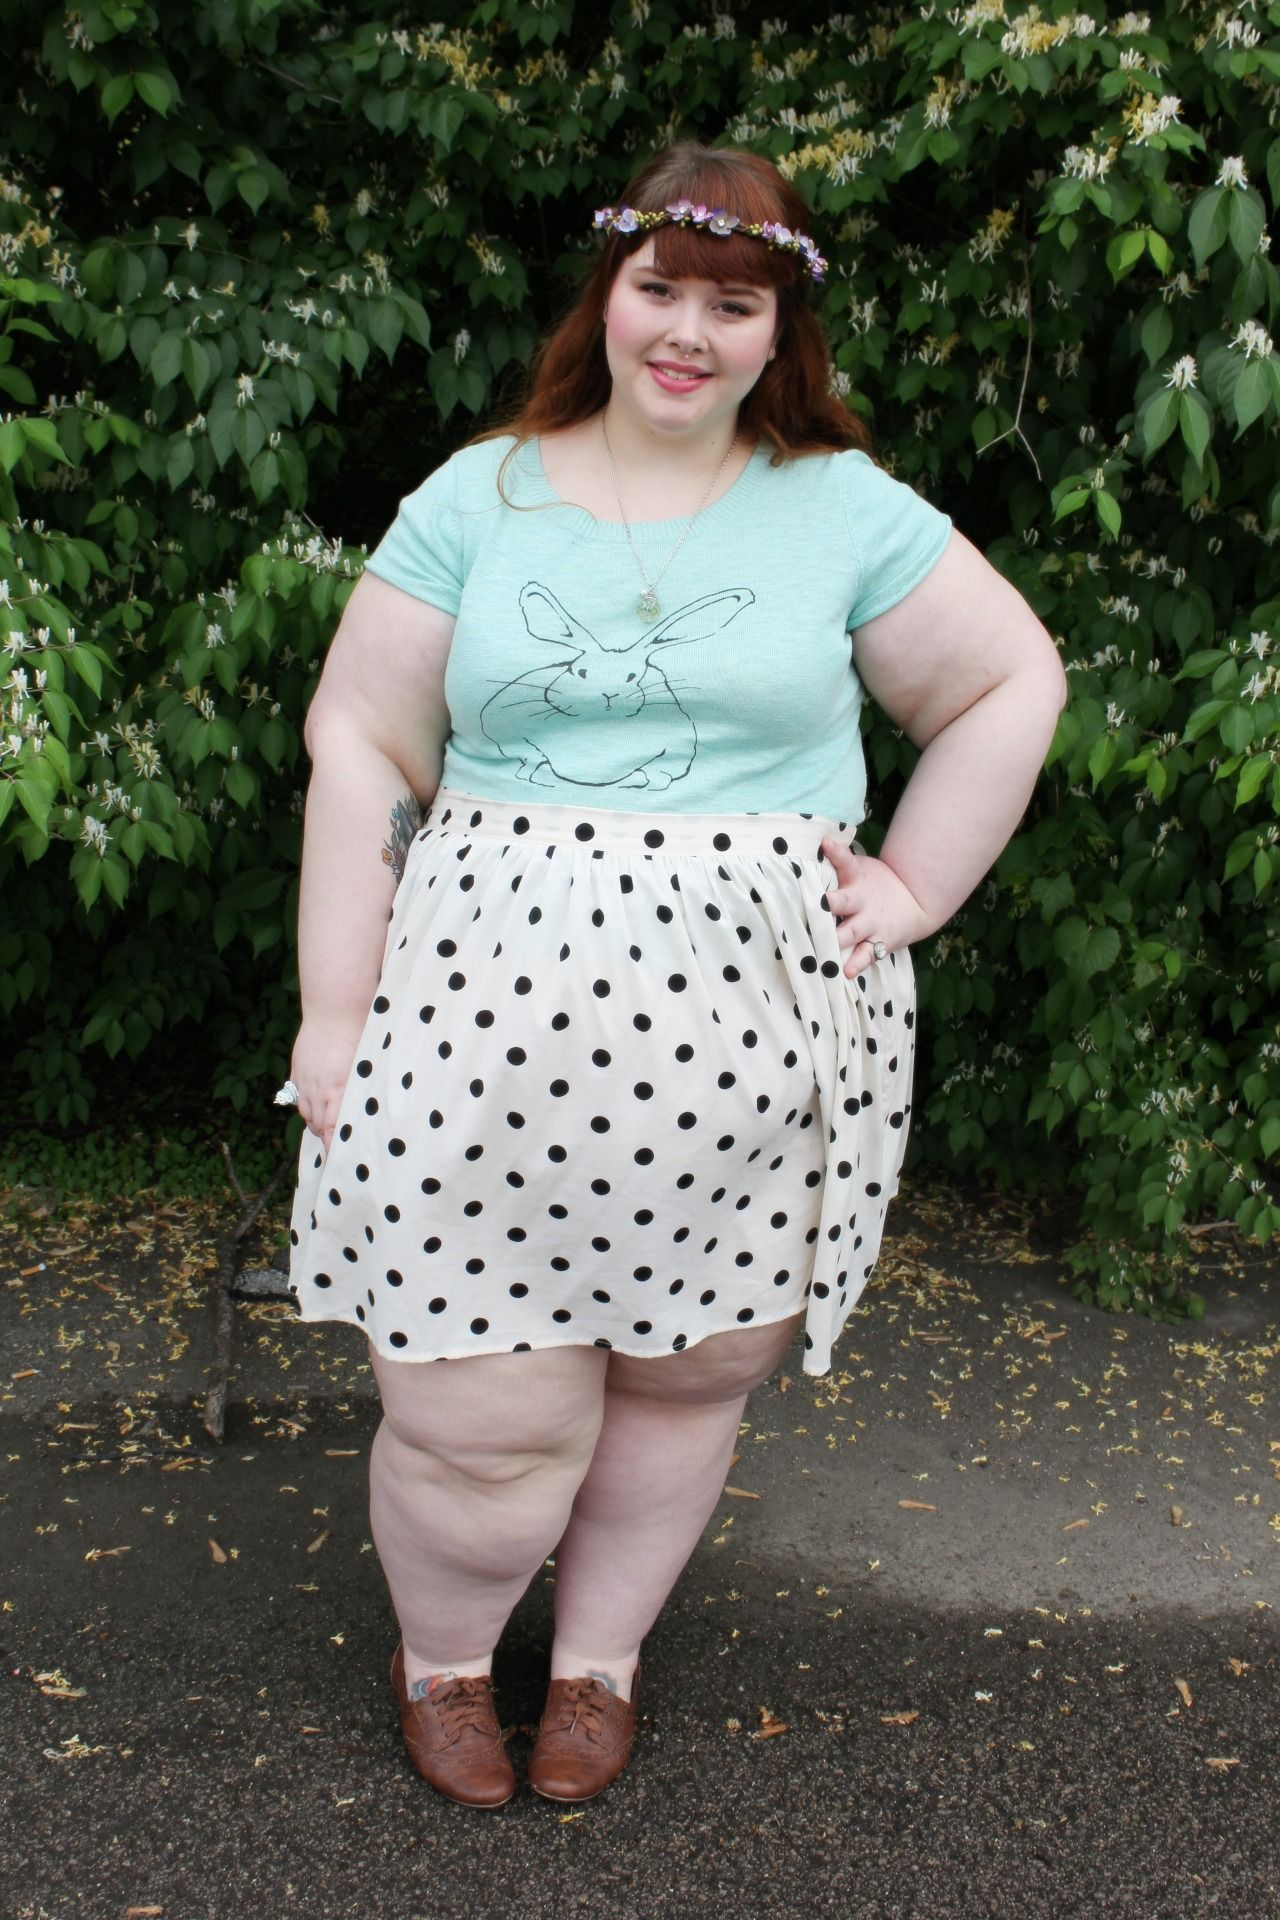 chubby teen in skirt